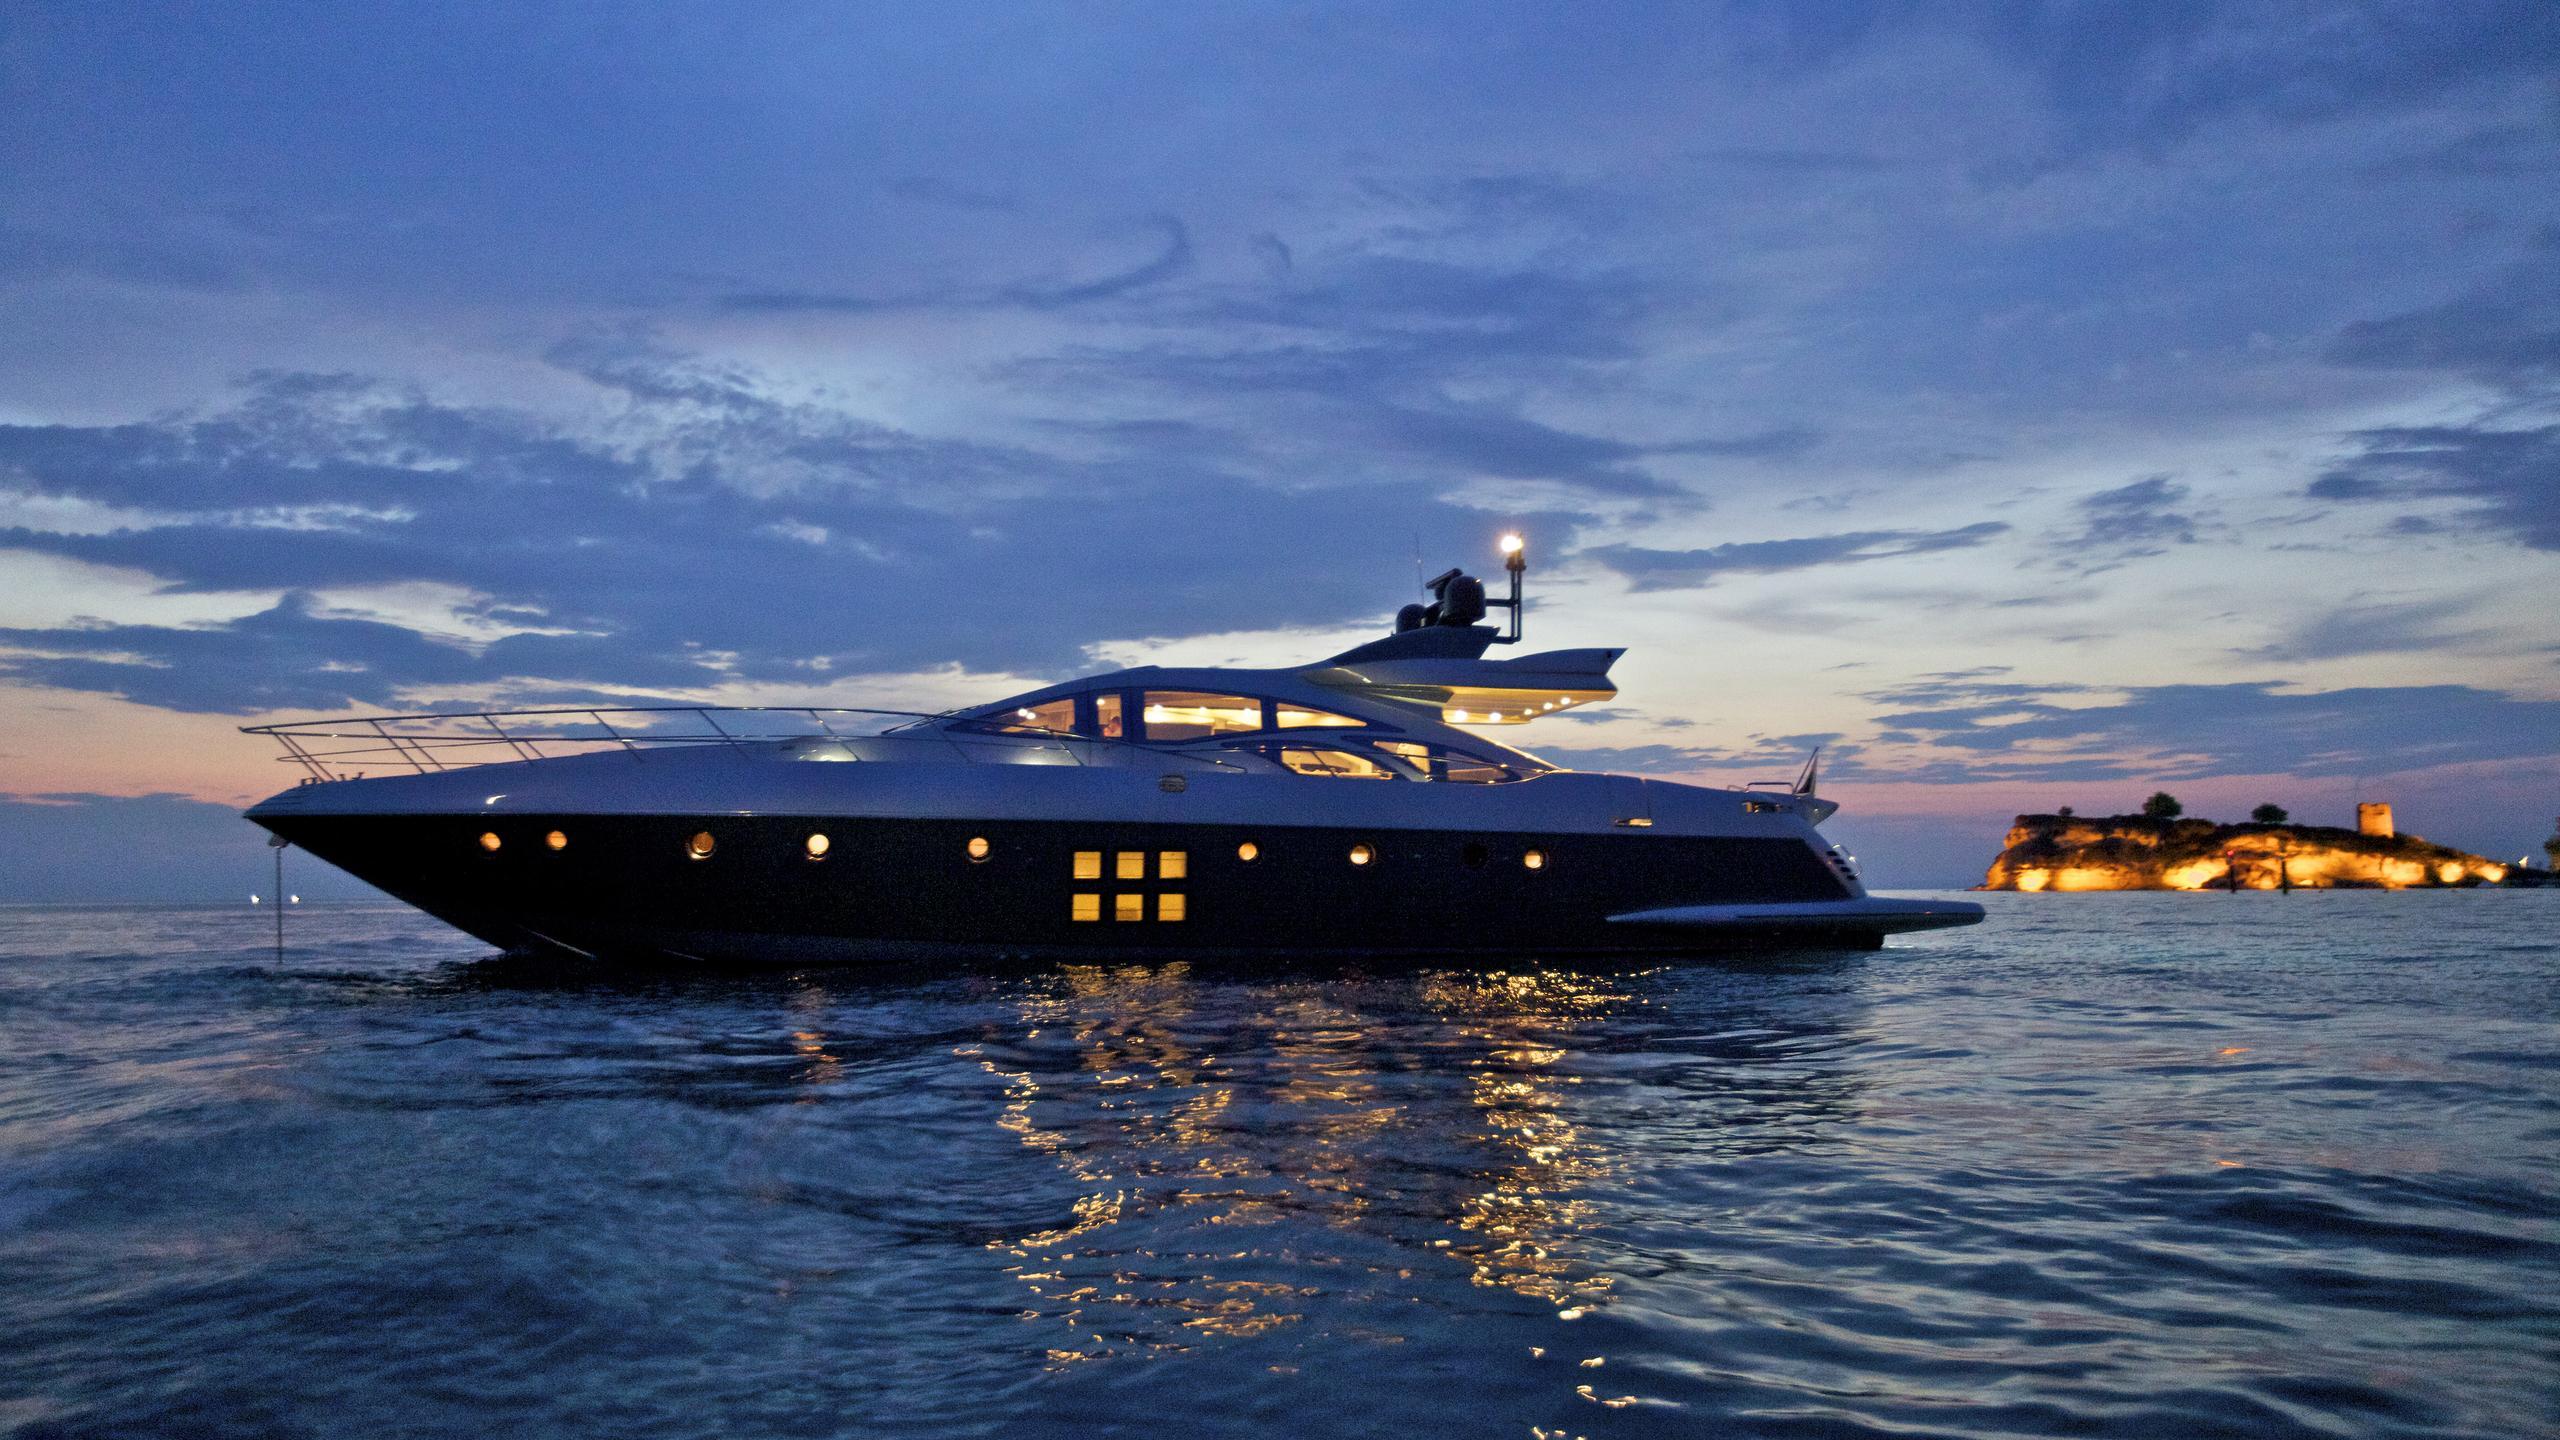 thea-malta-yacht-night-profile